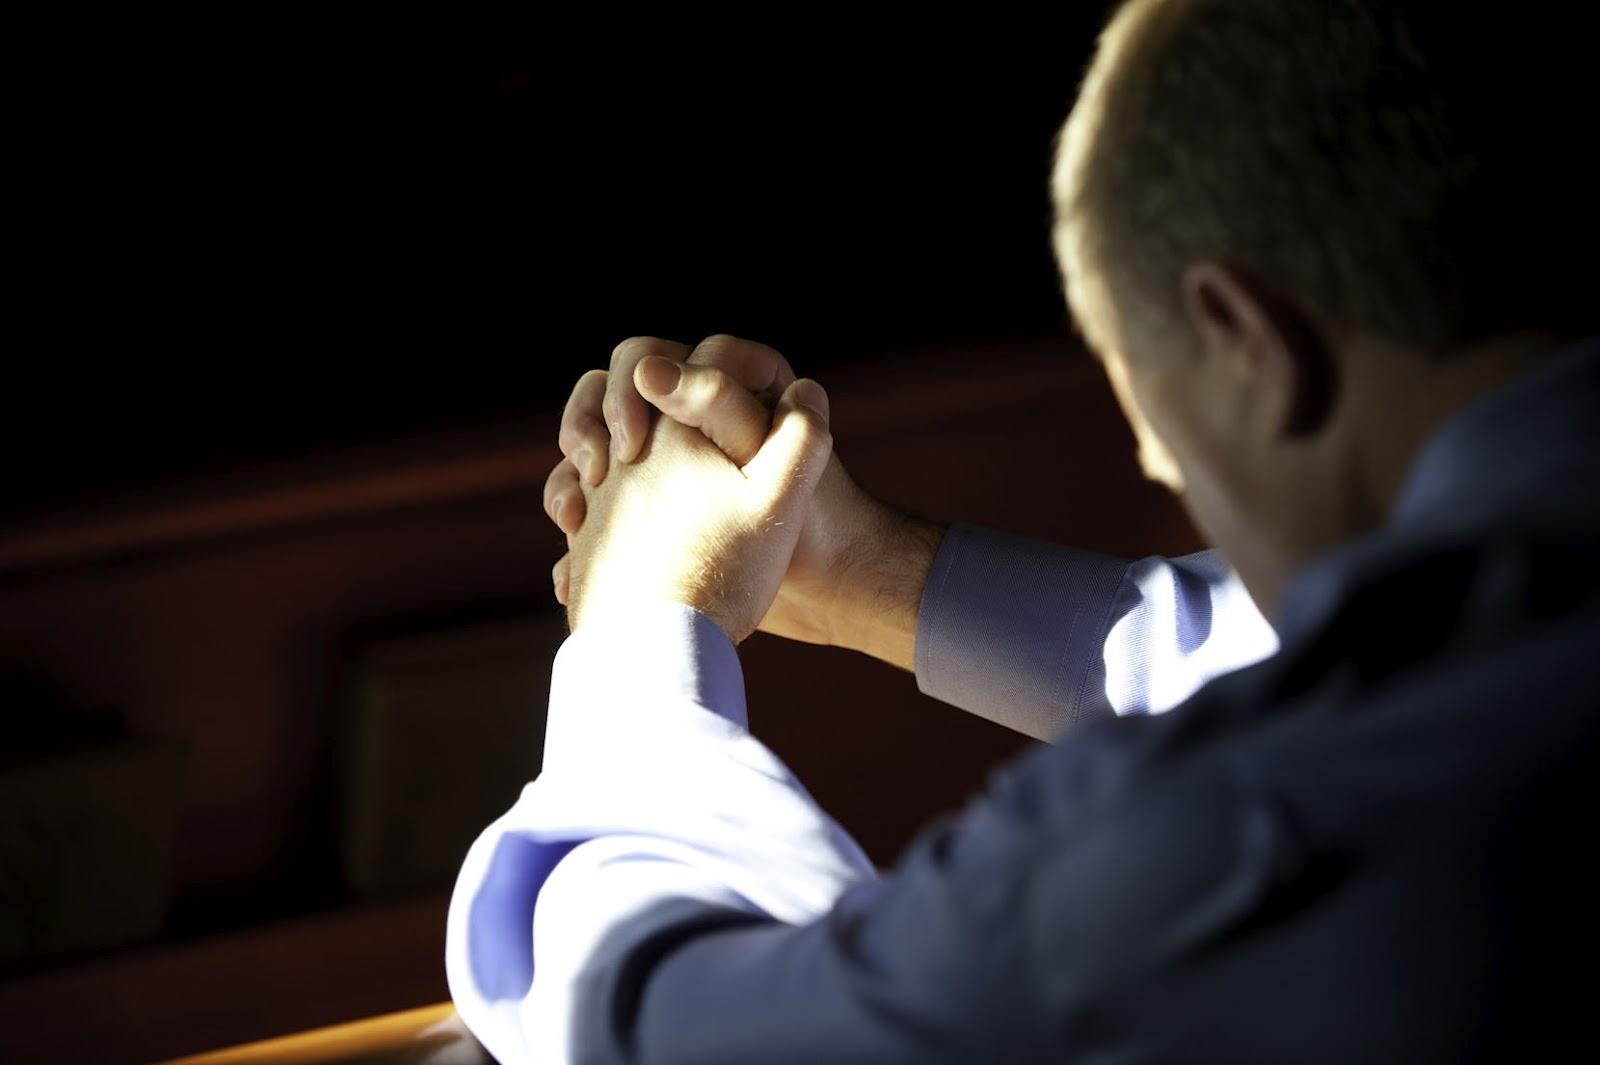 Protestanti i (Rimo)Katolici - u čemu je razlika